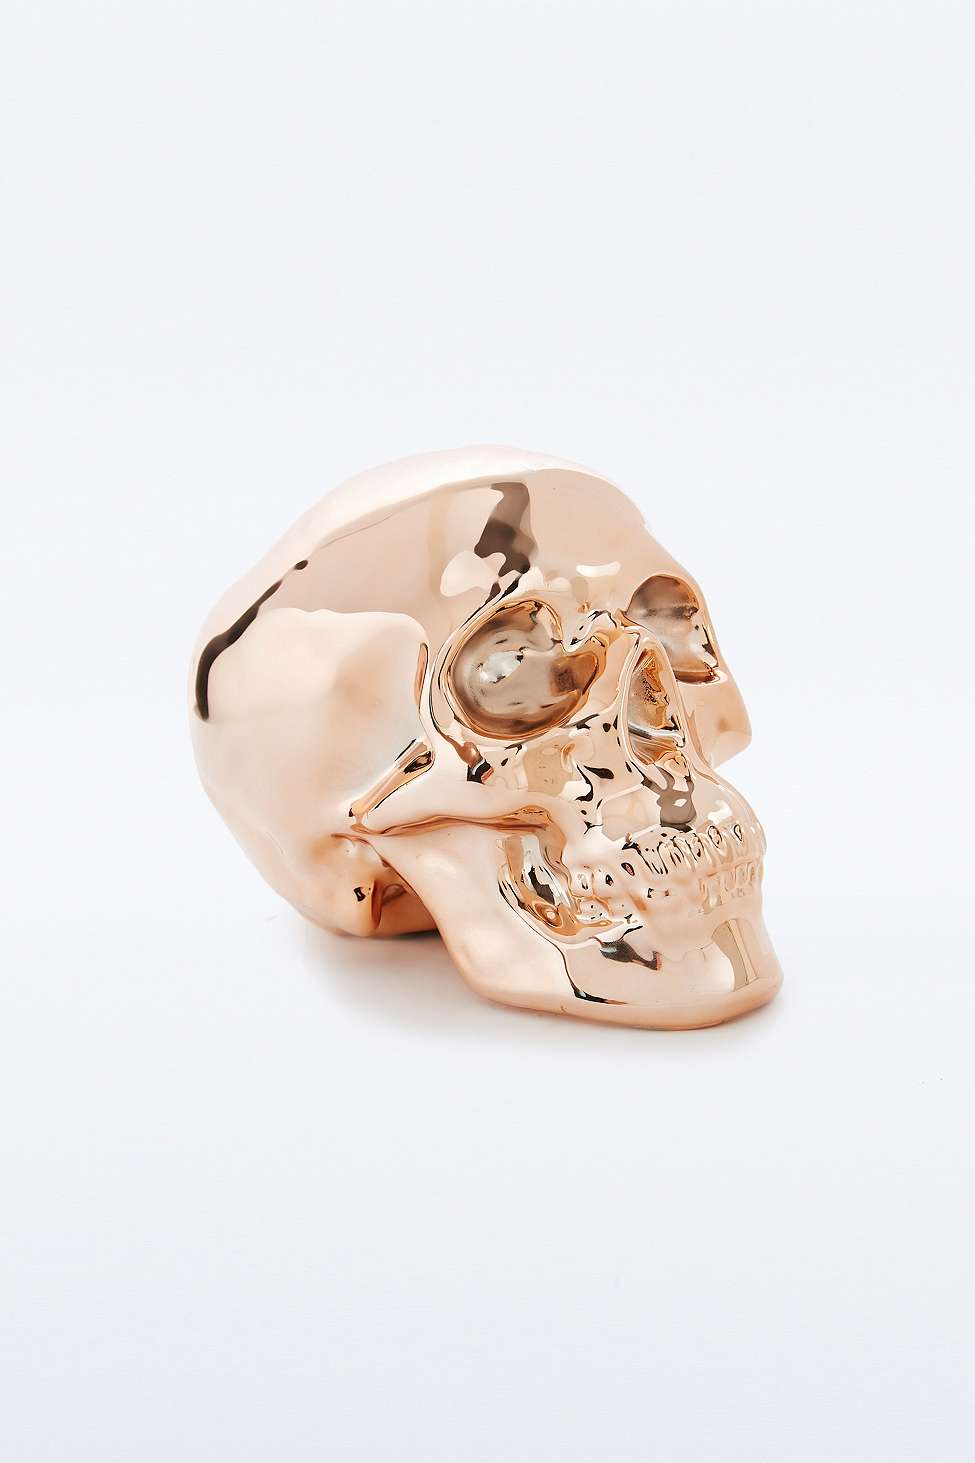 Copper Skull MoneyBox